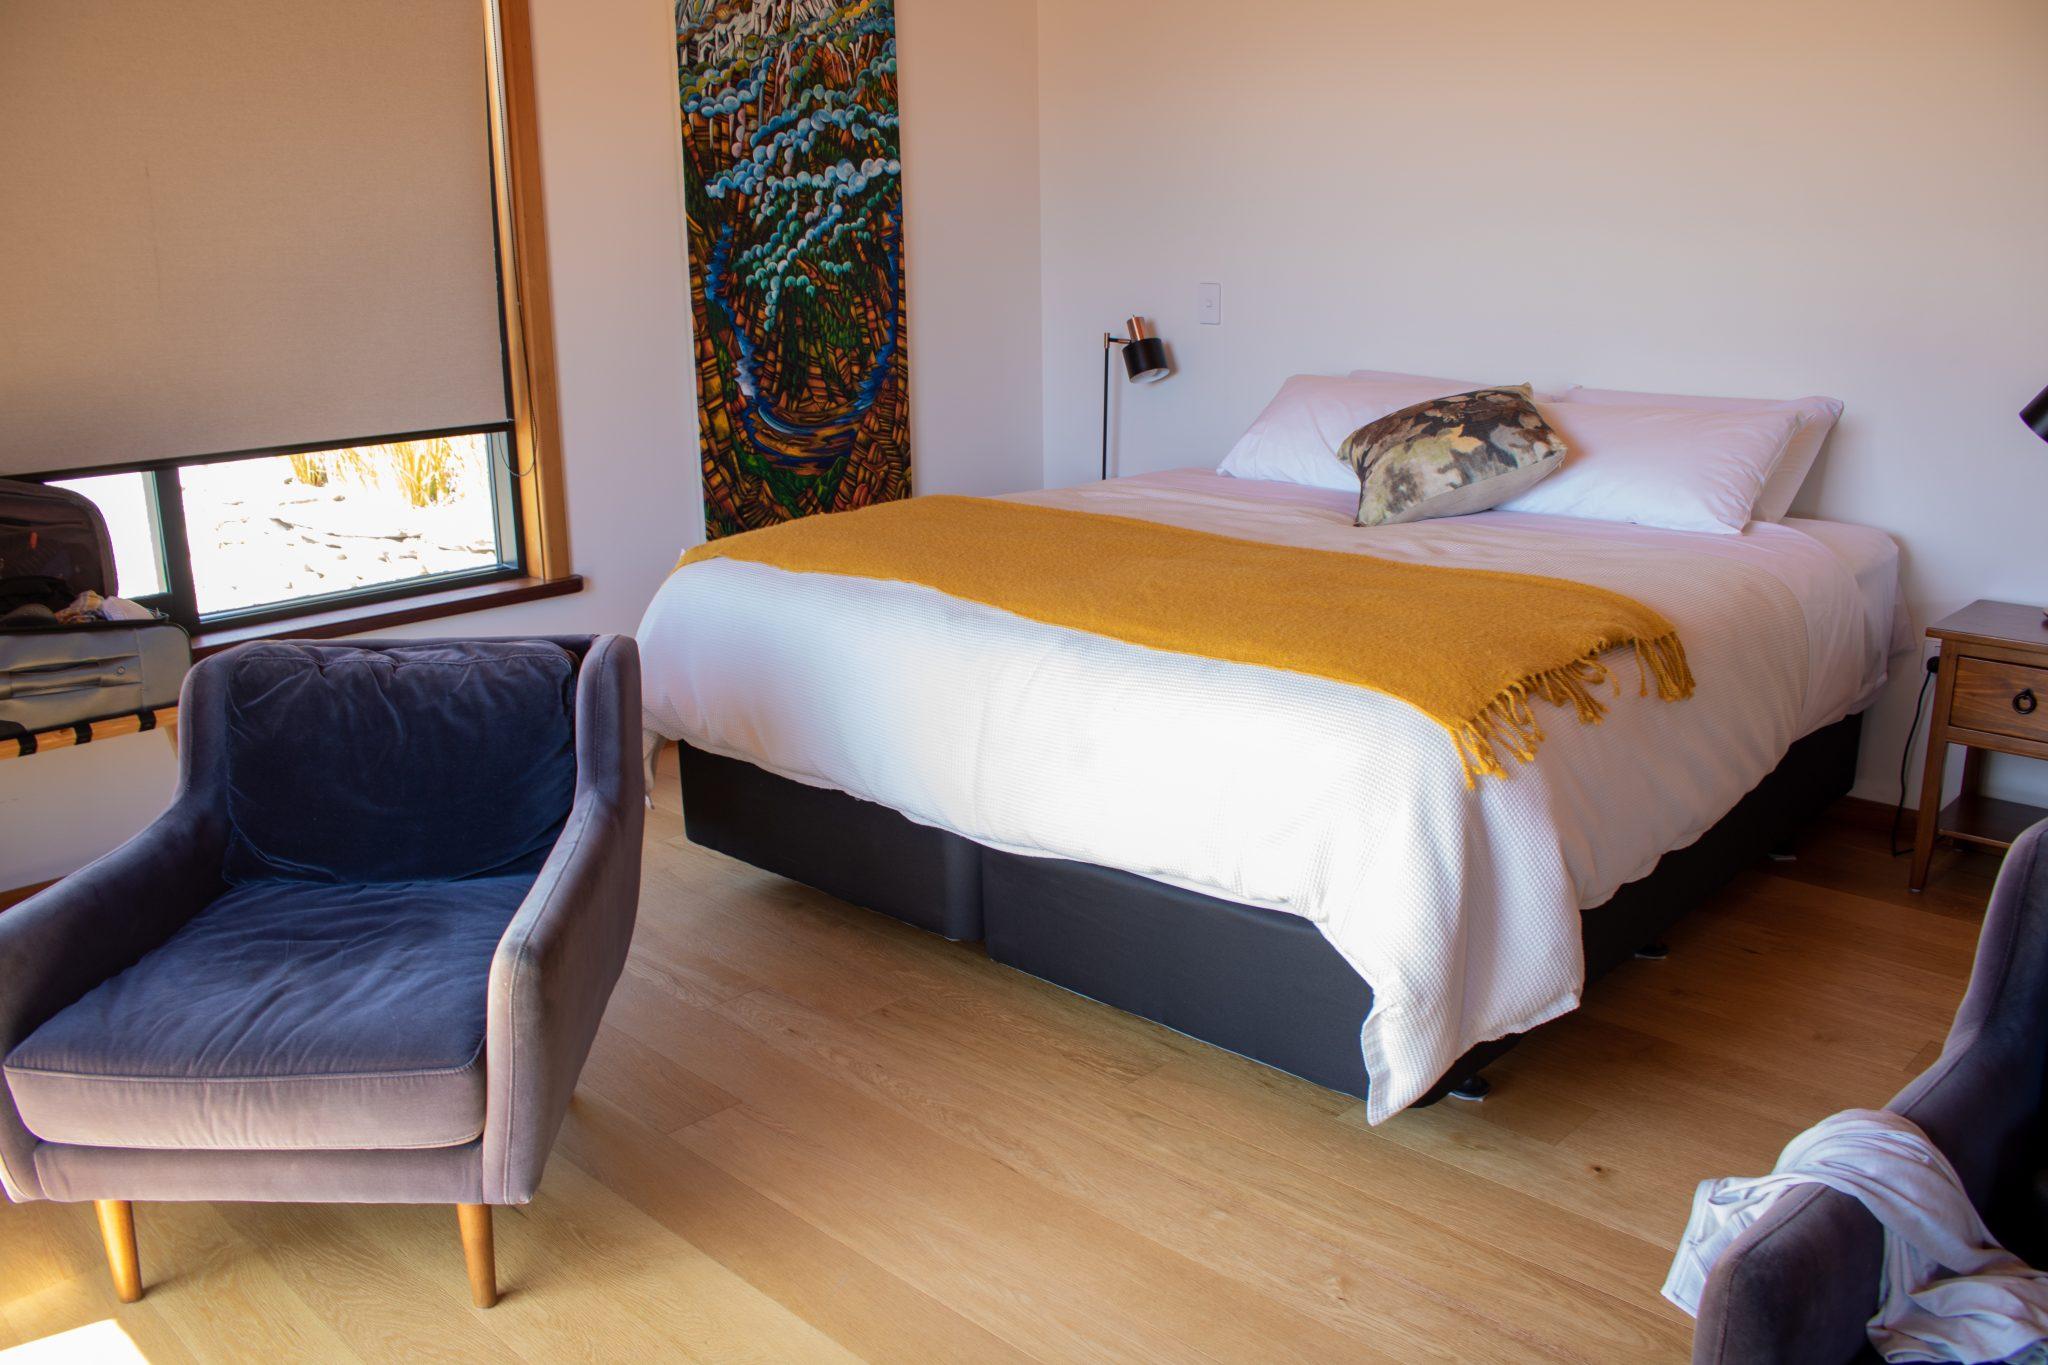 A Wanaka Airbnb studio chalet